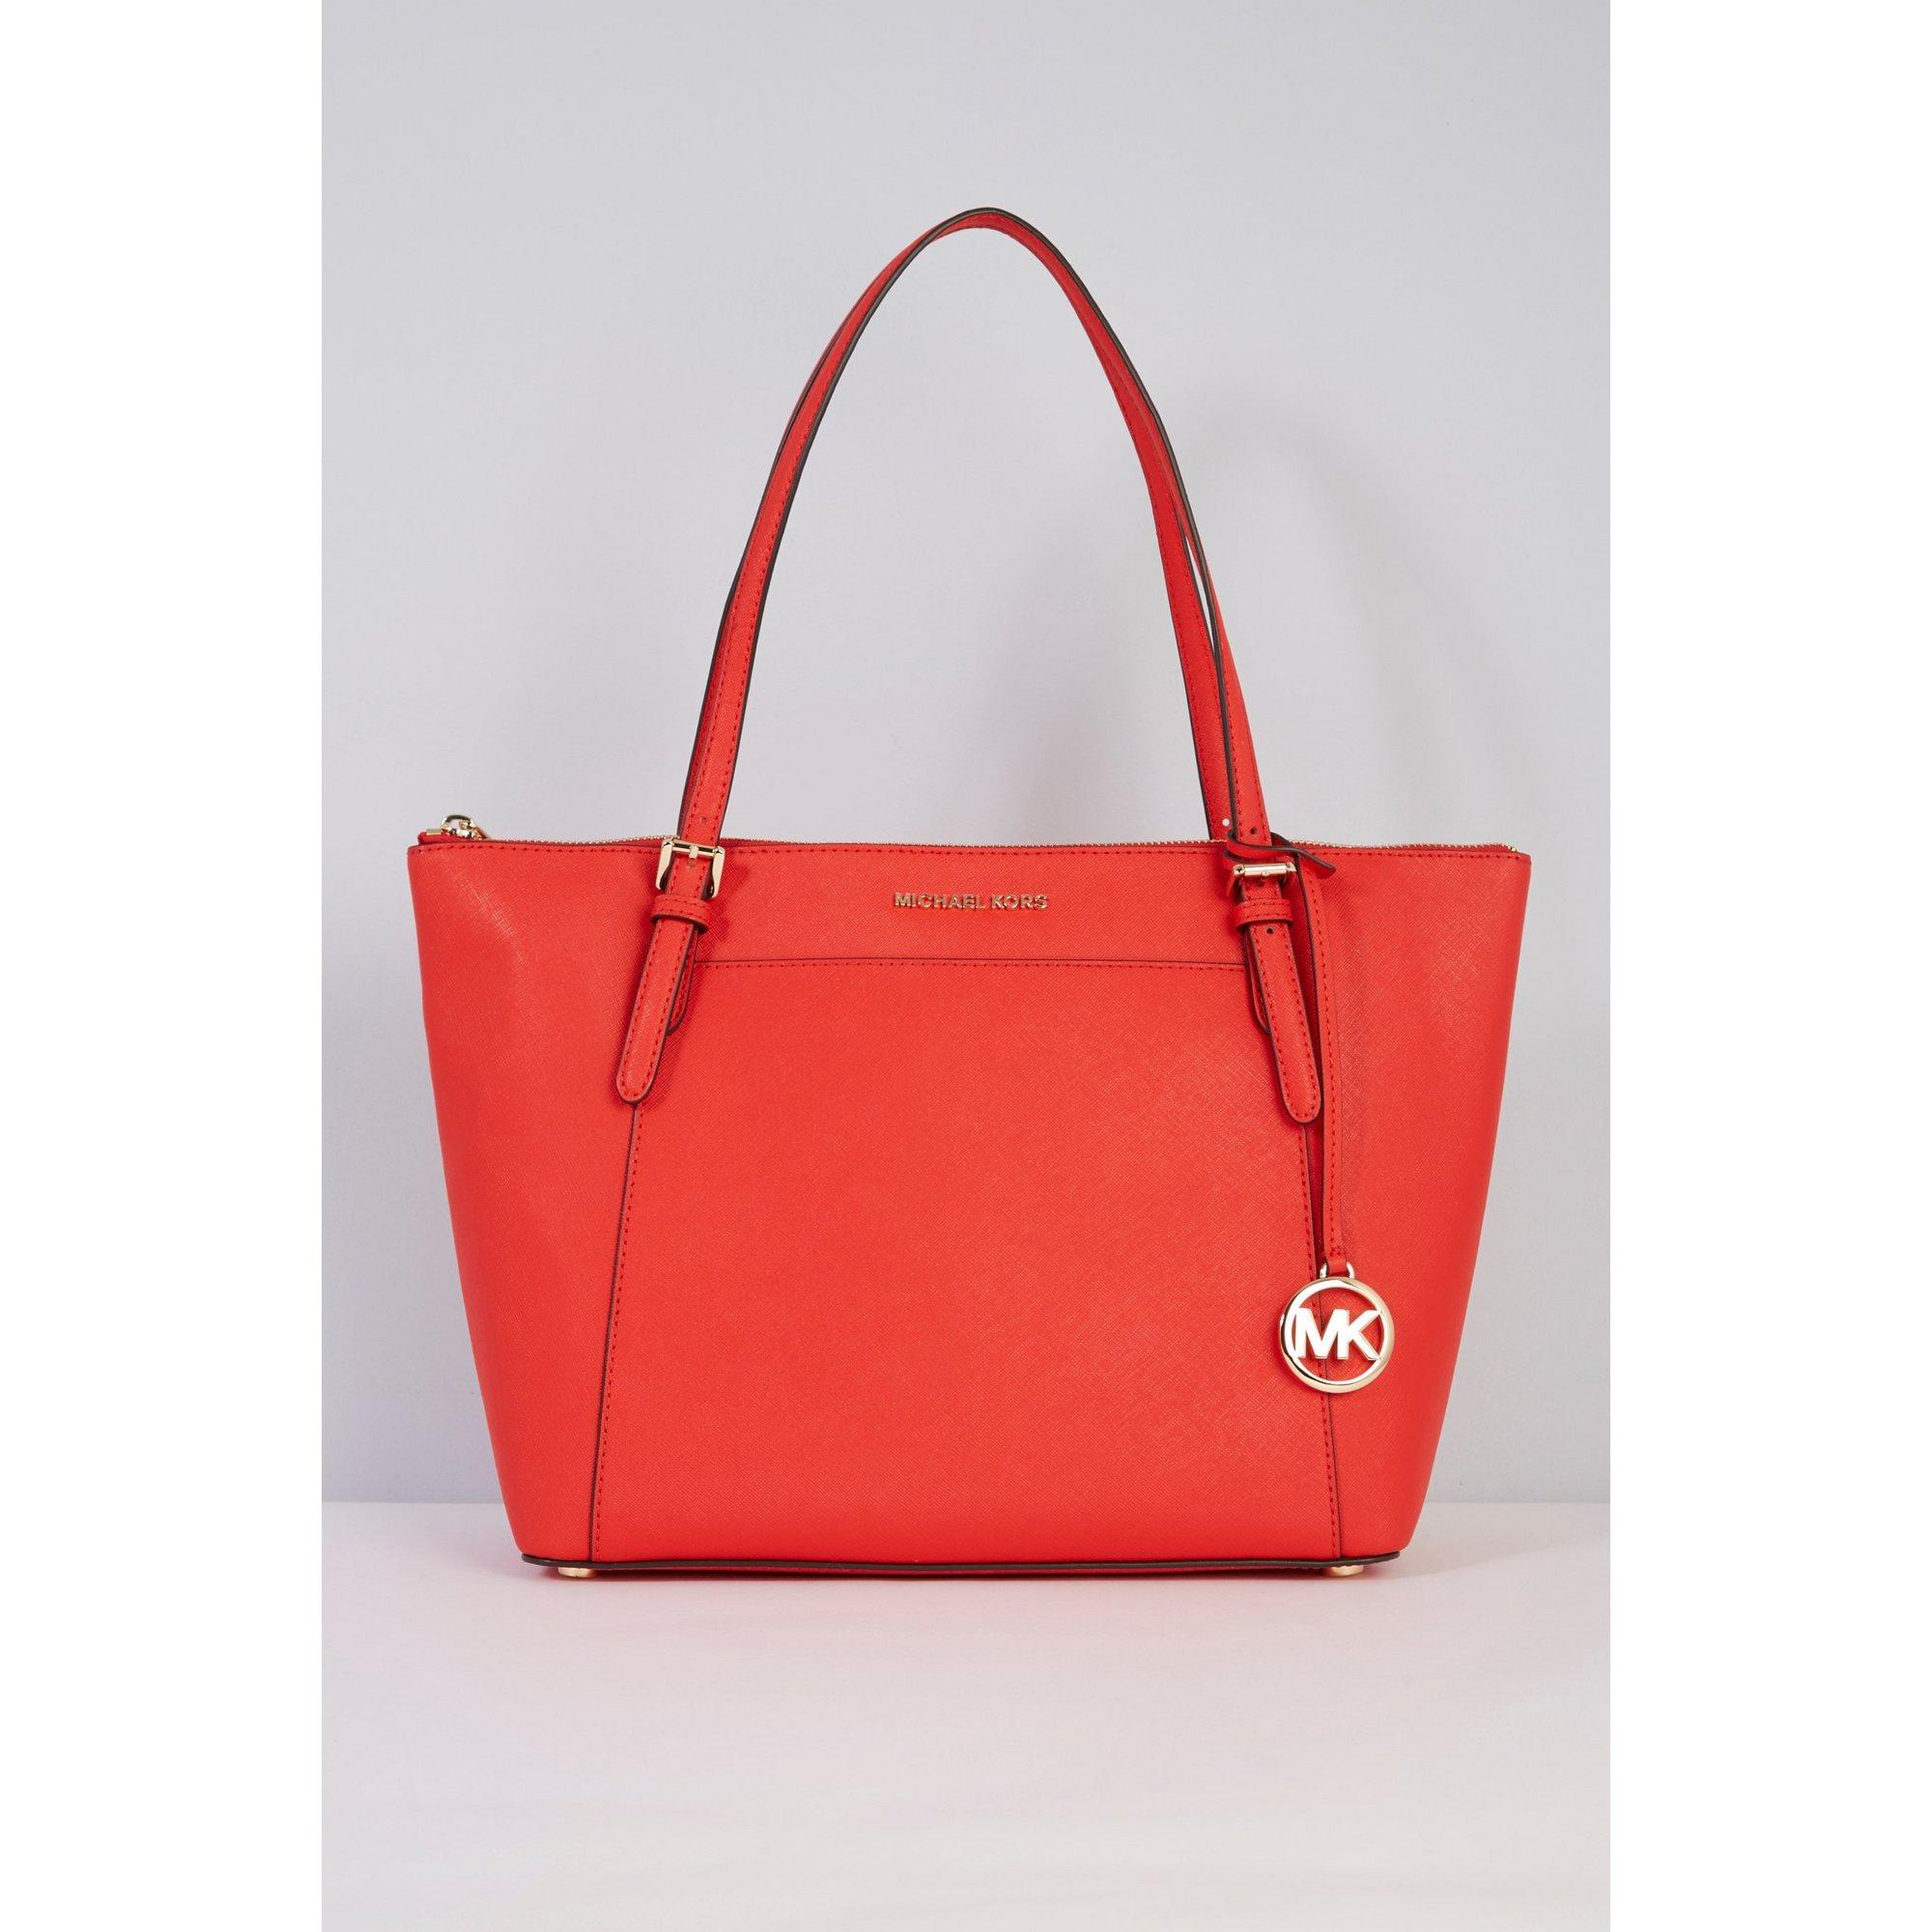 Image of Michael Kors Ciara Red Leather Tote Bag